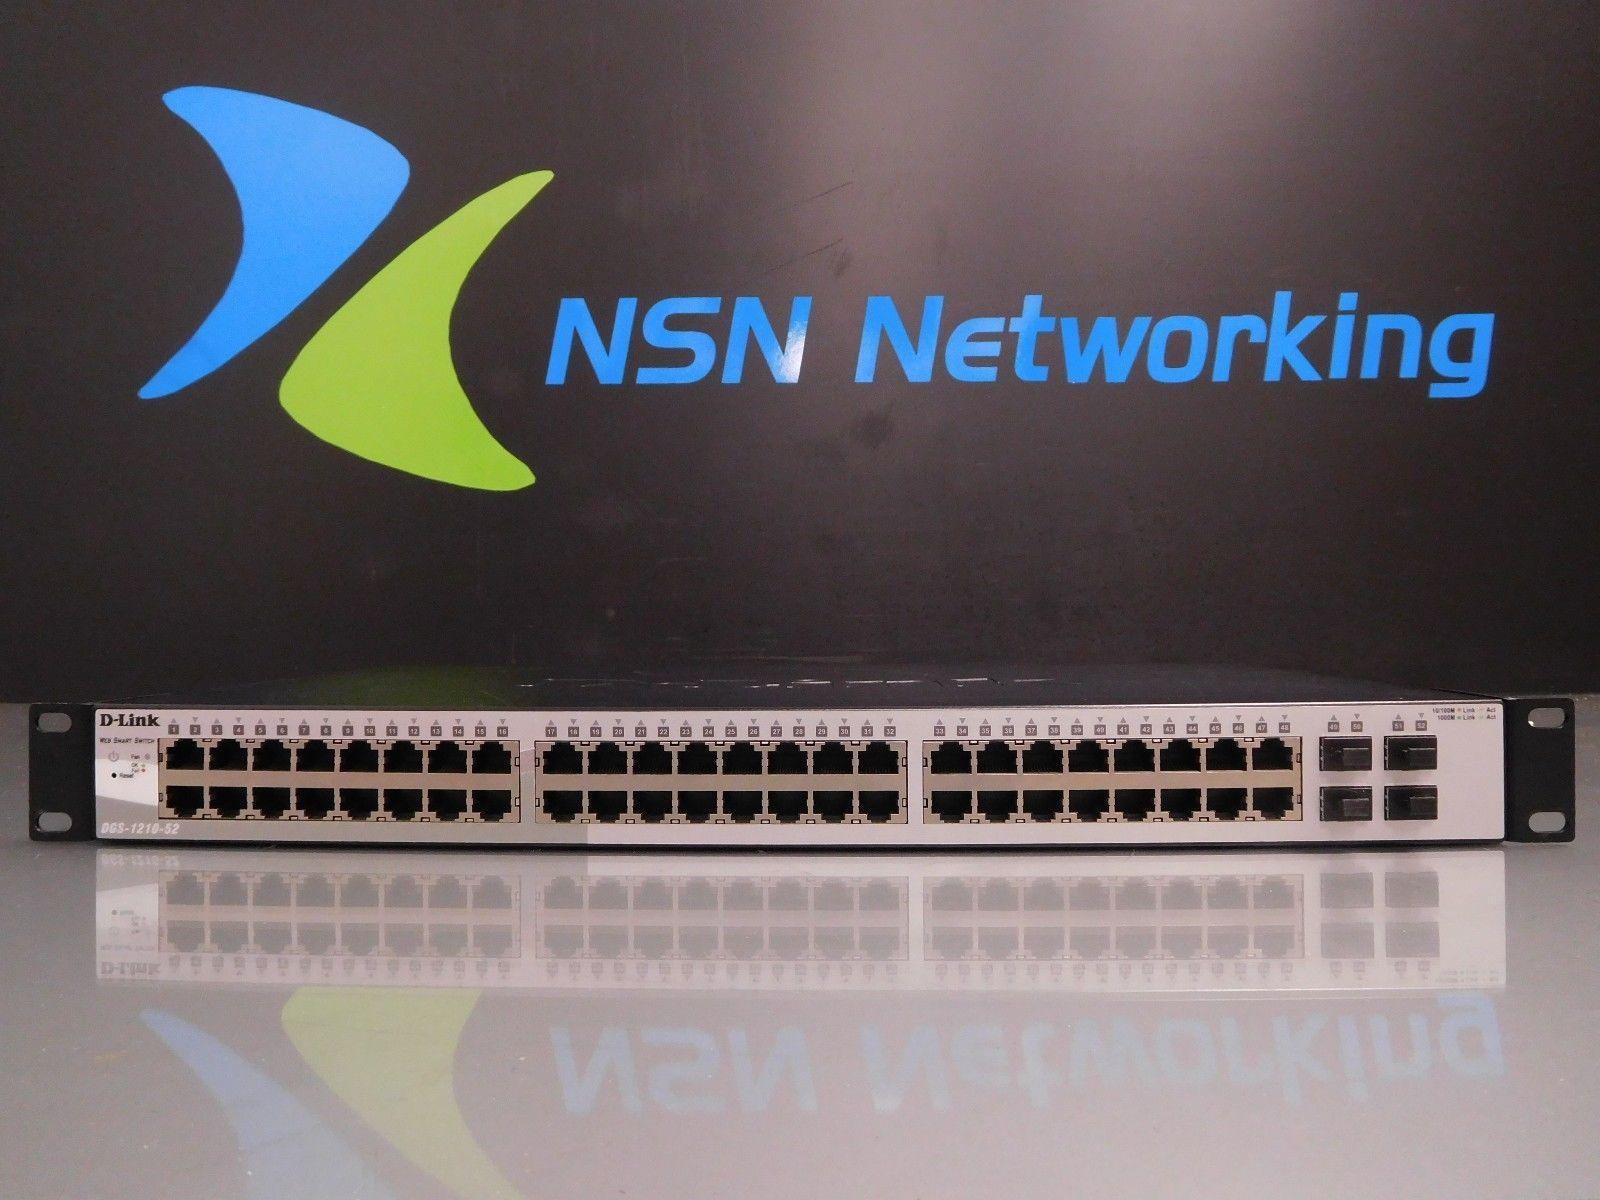 D-Link 48-Ports External Switch Managed DES-3252P w// Rack Ears OC